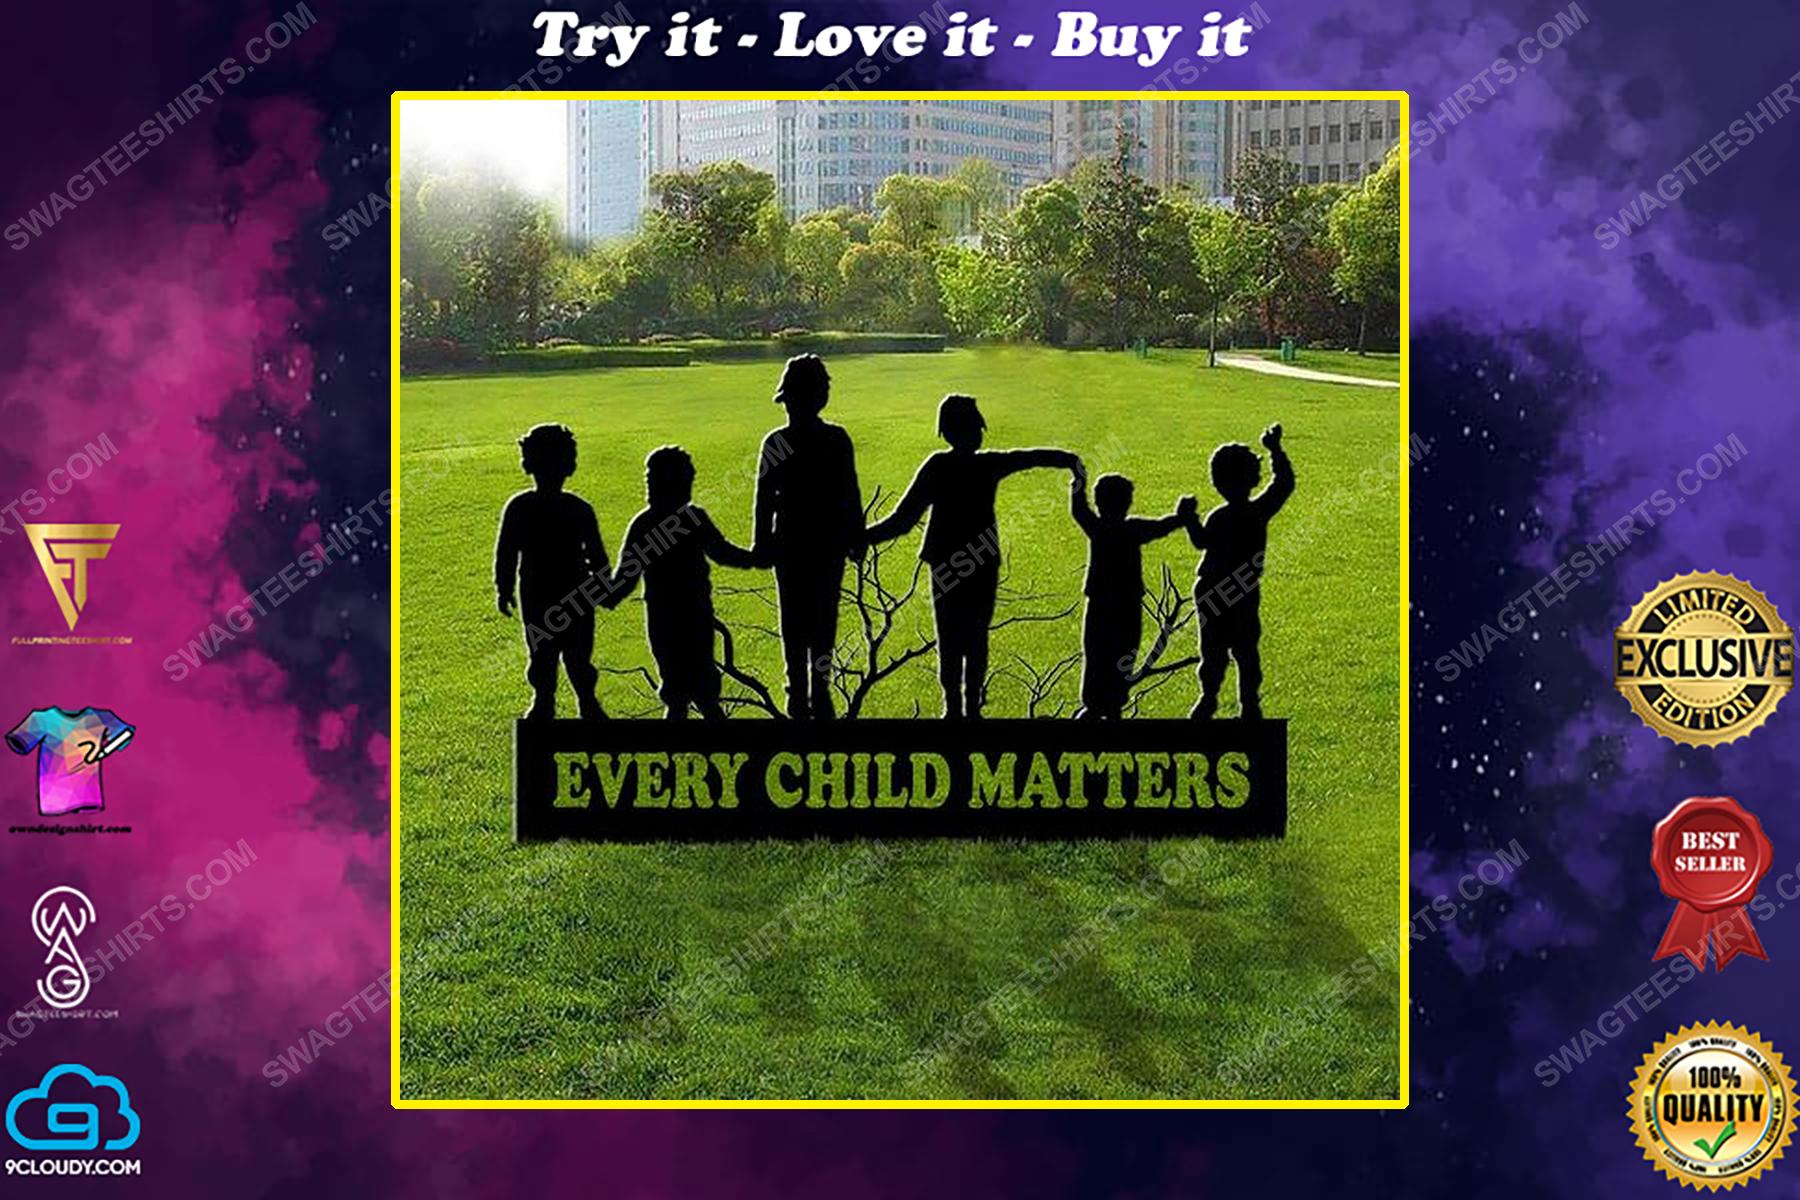 Awareness child lives matter movement merch every child matters yard sign